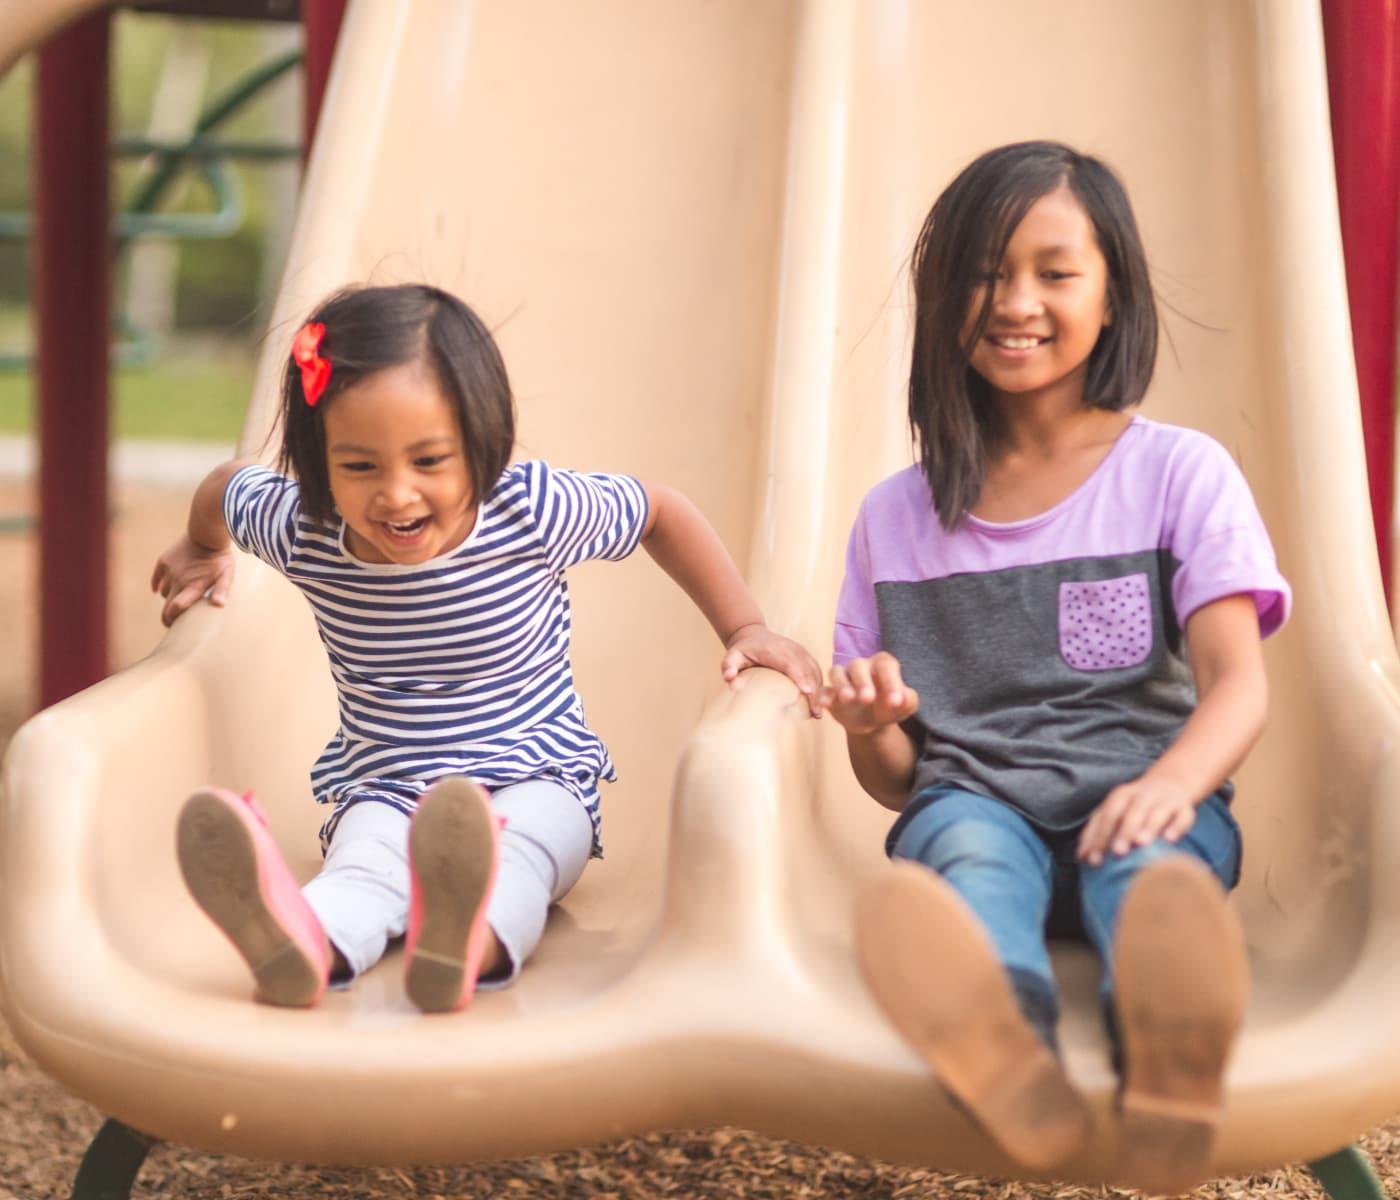 Little girls sliding at the park in Alexandria, Virginia near Mount Vernon Garden Apartments